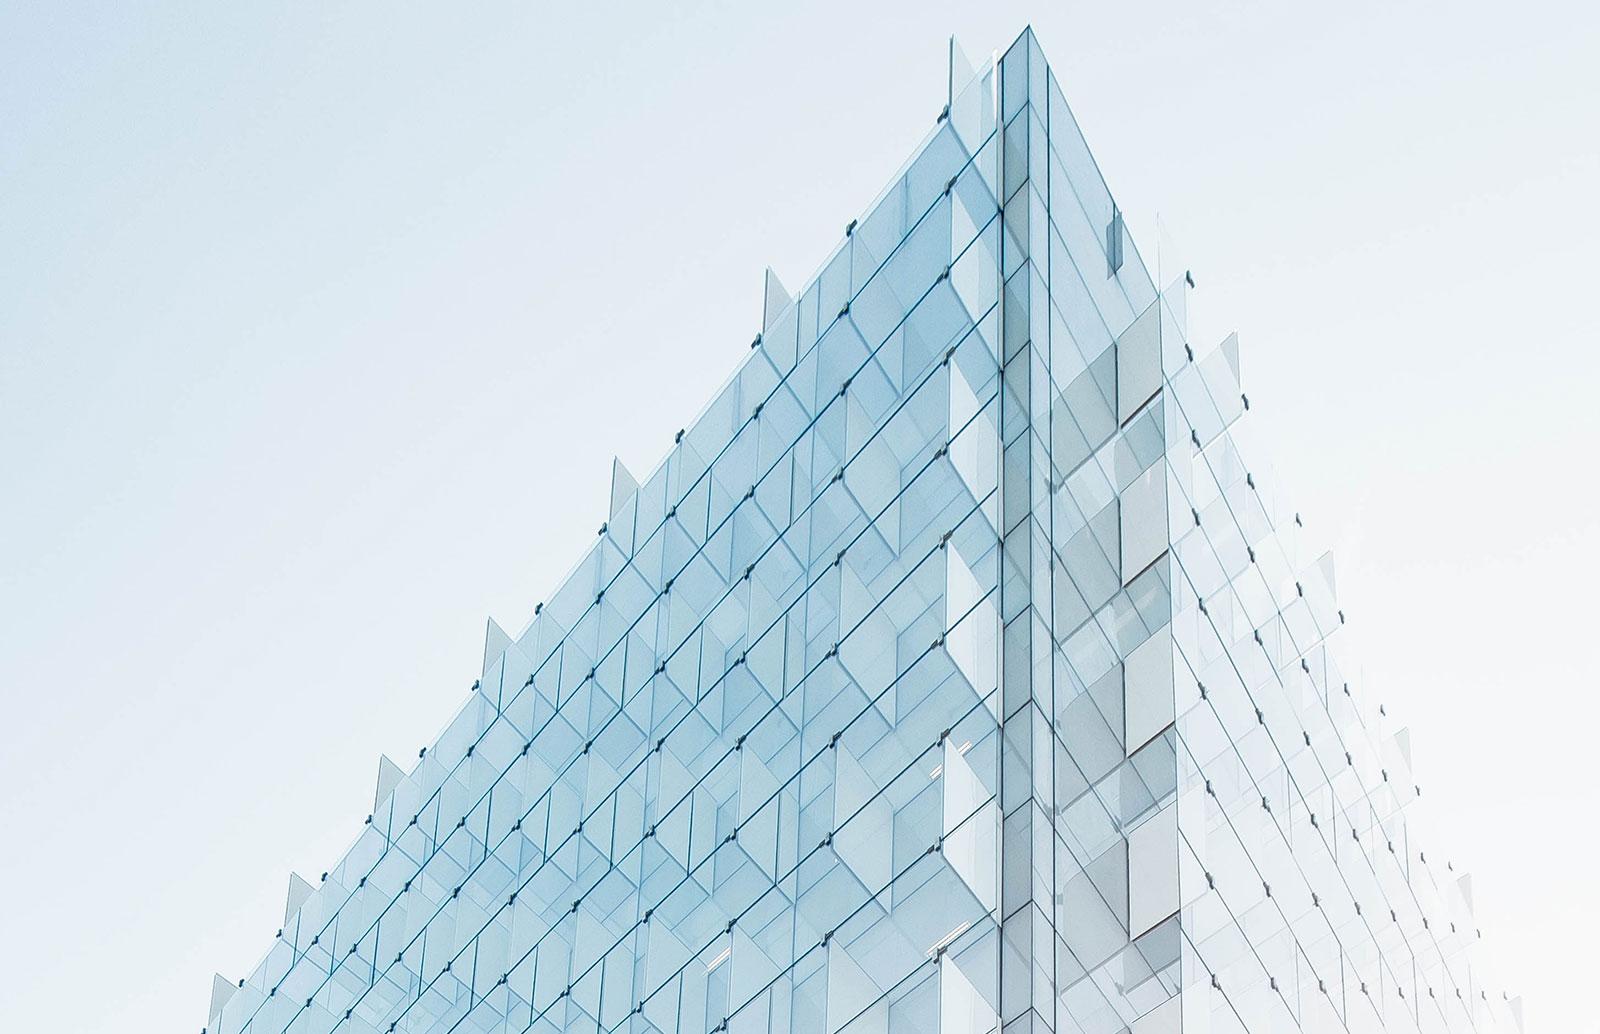 Minimalist Building